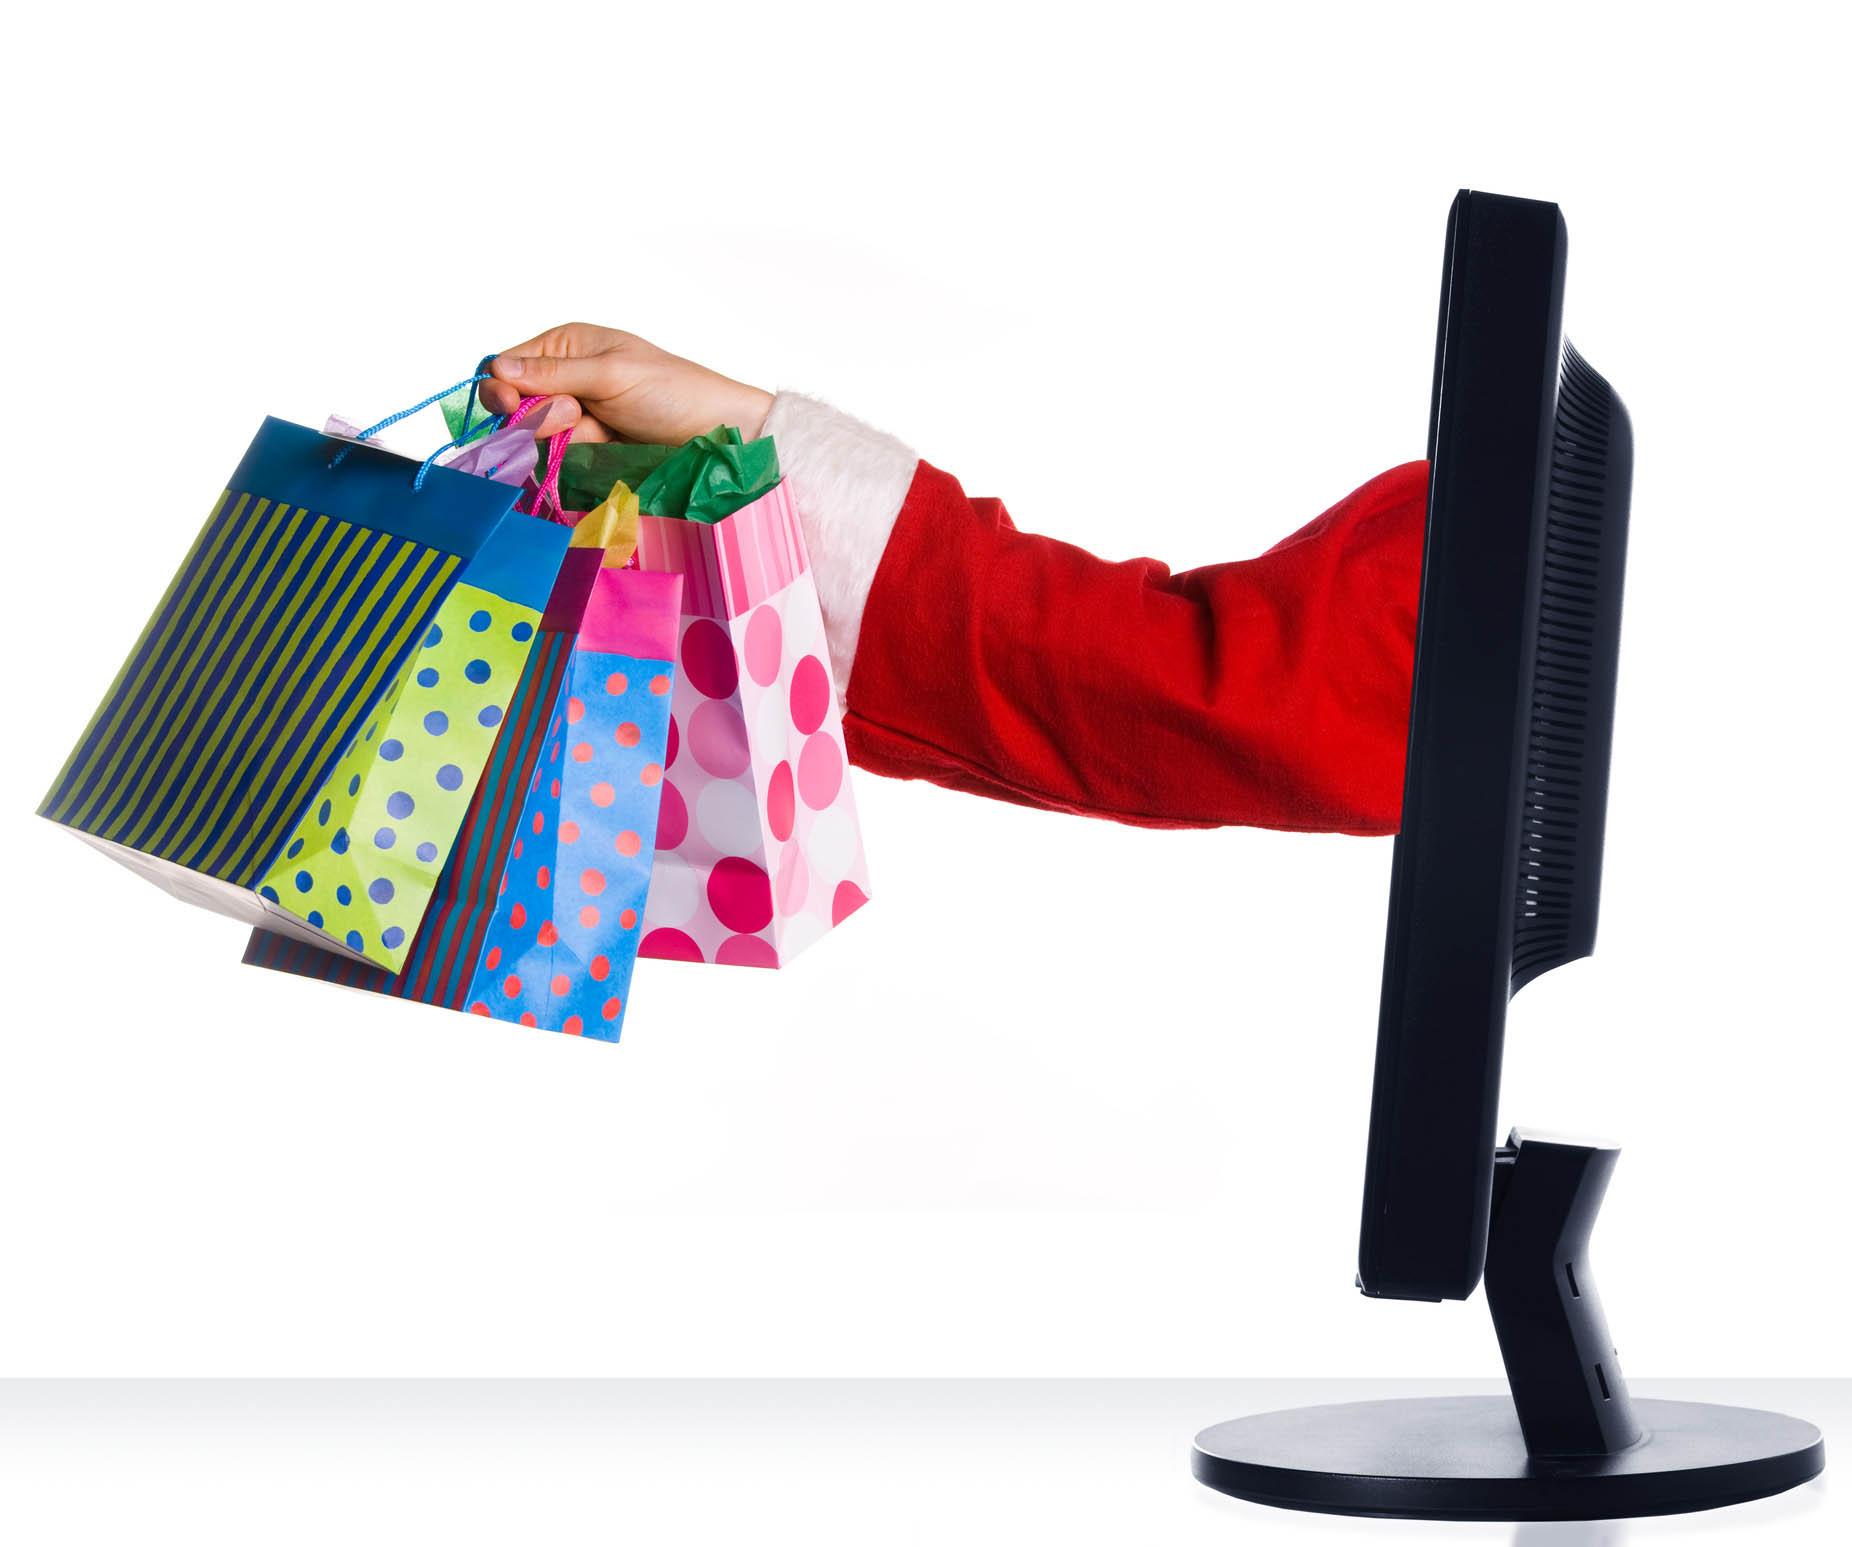 online shopping, shopping online